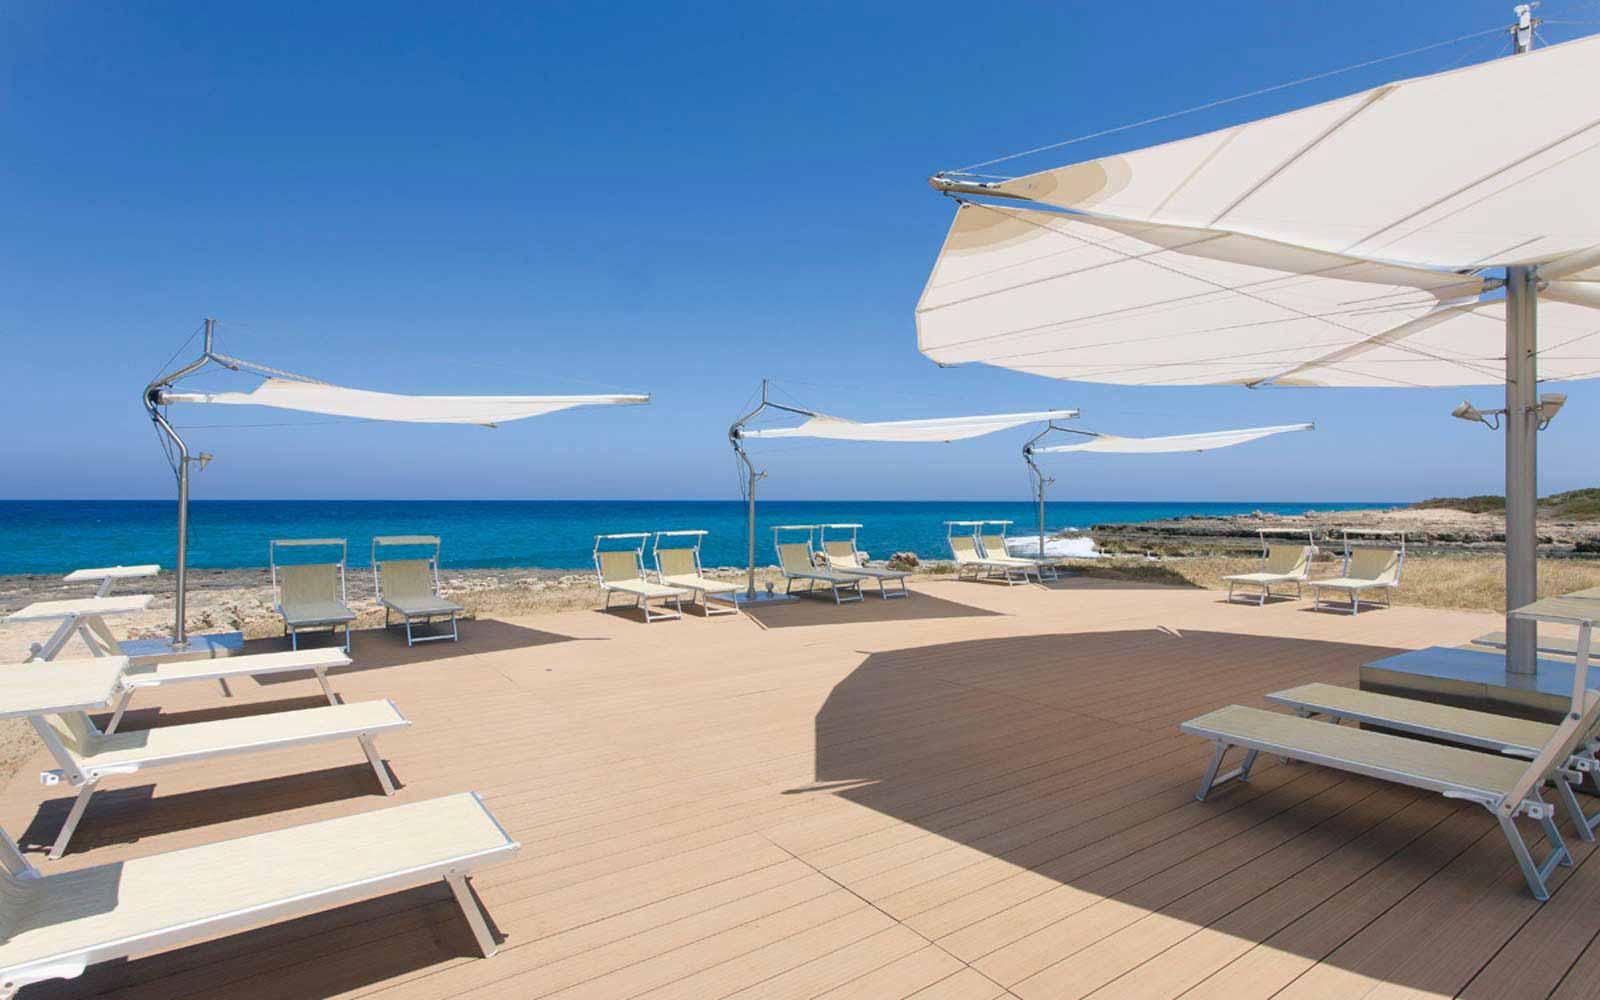 The beach by Grand Hotel Masseria Santa Lucia